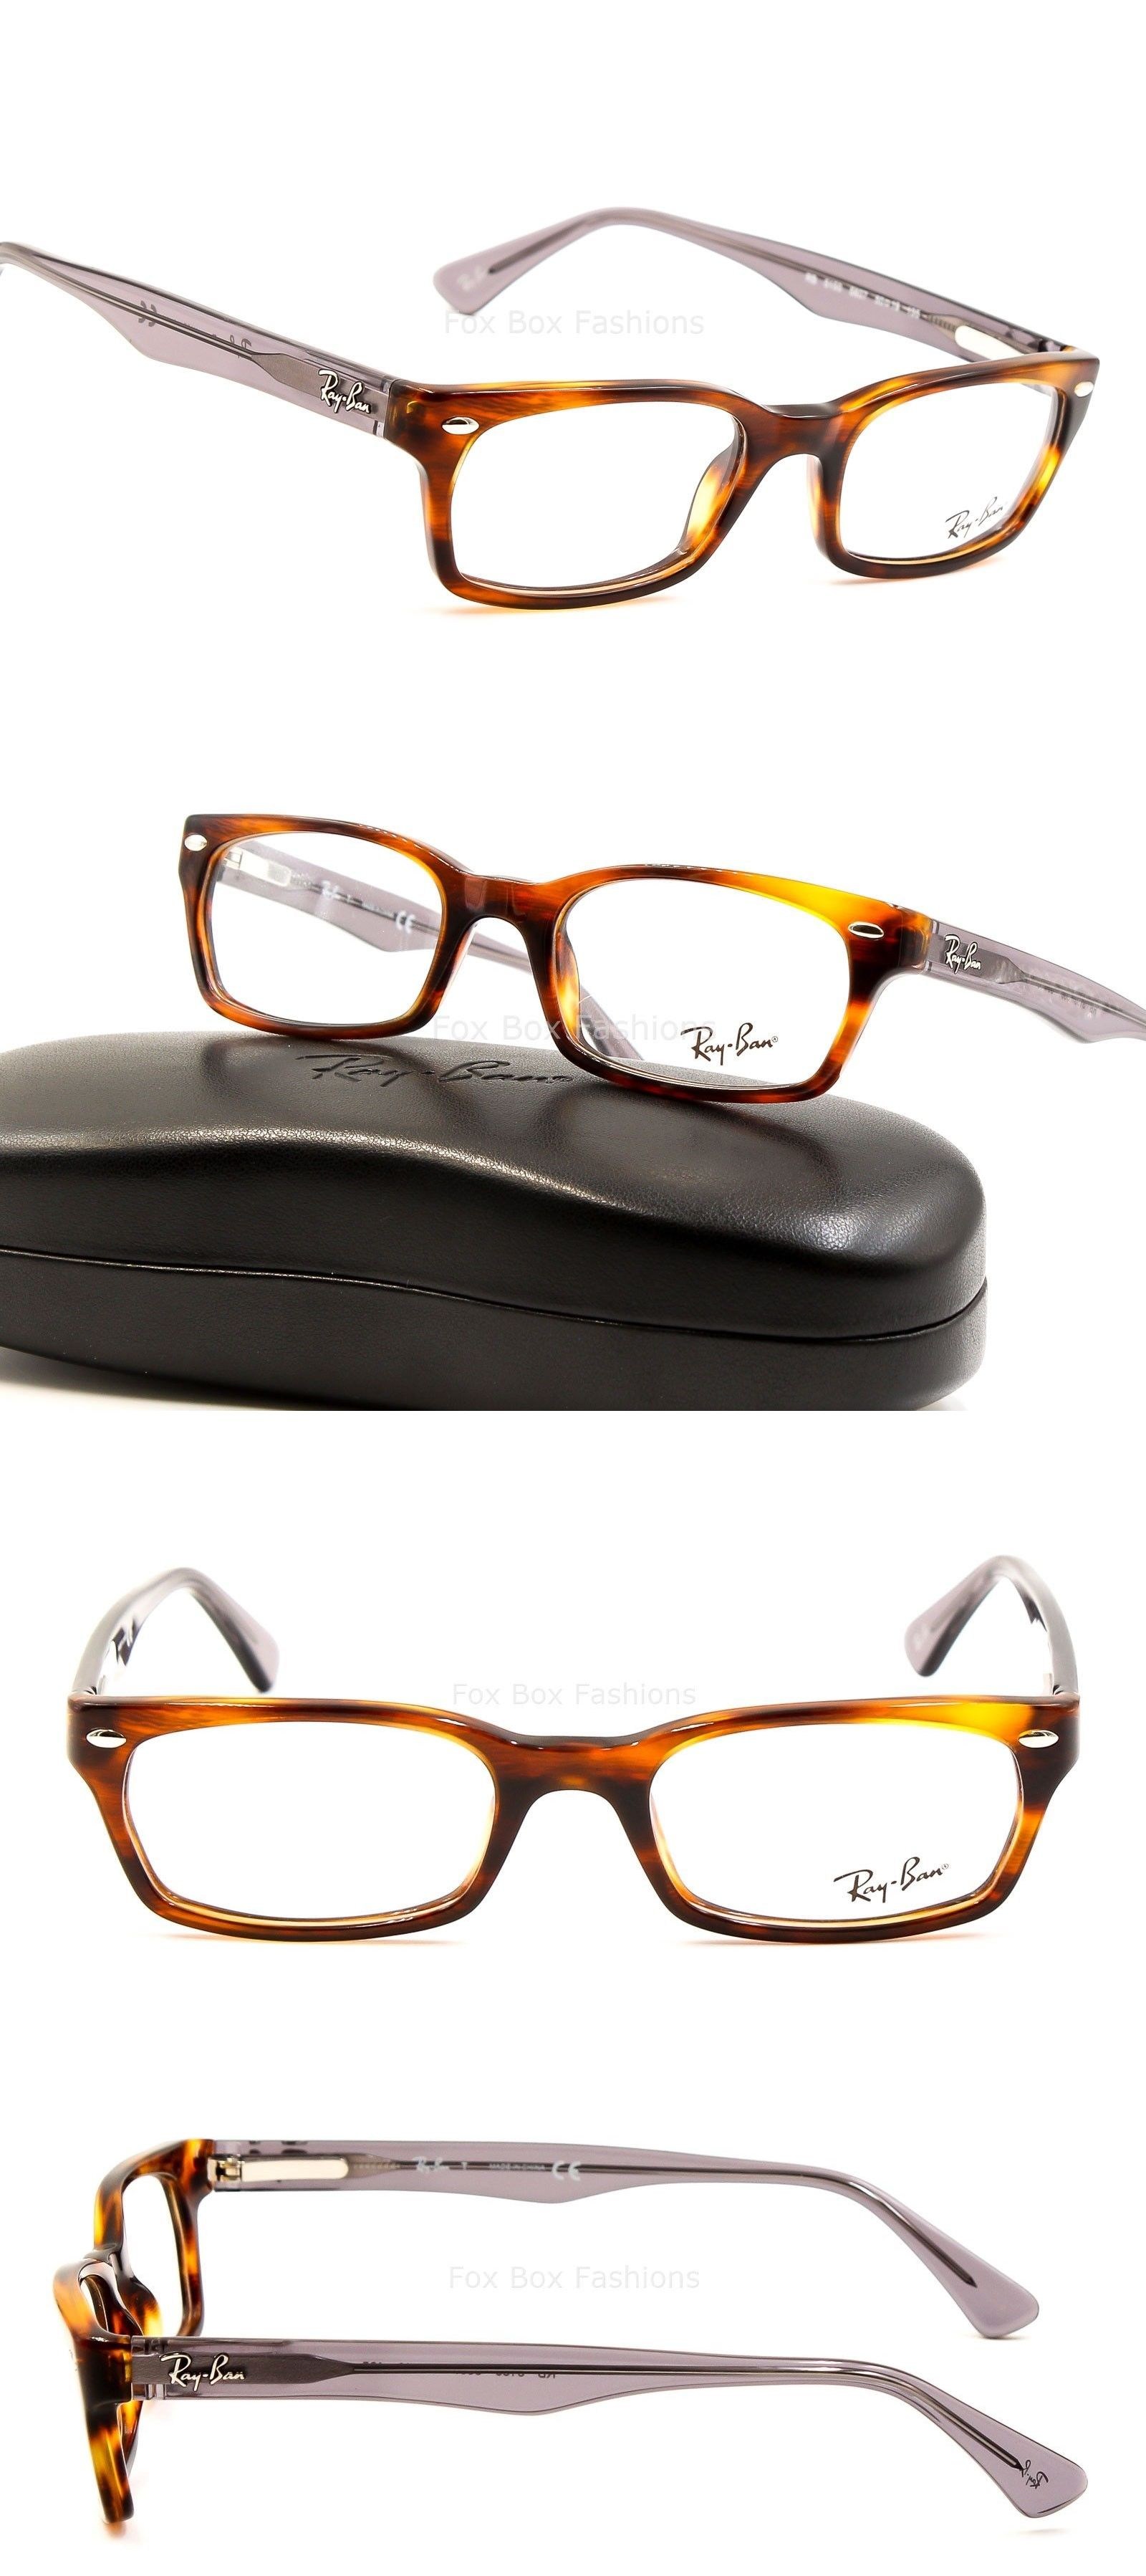 Eyeglass Frames: Ray-Ban Rb 5150 5607 Eyeglasses Optical Frames ...